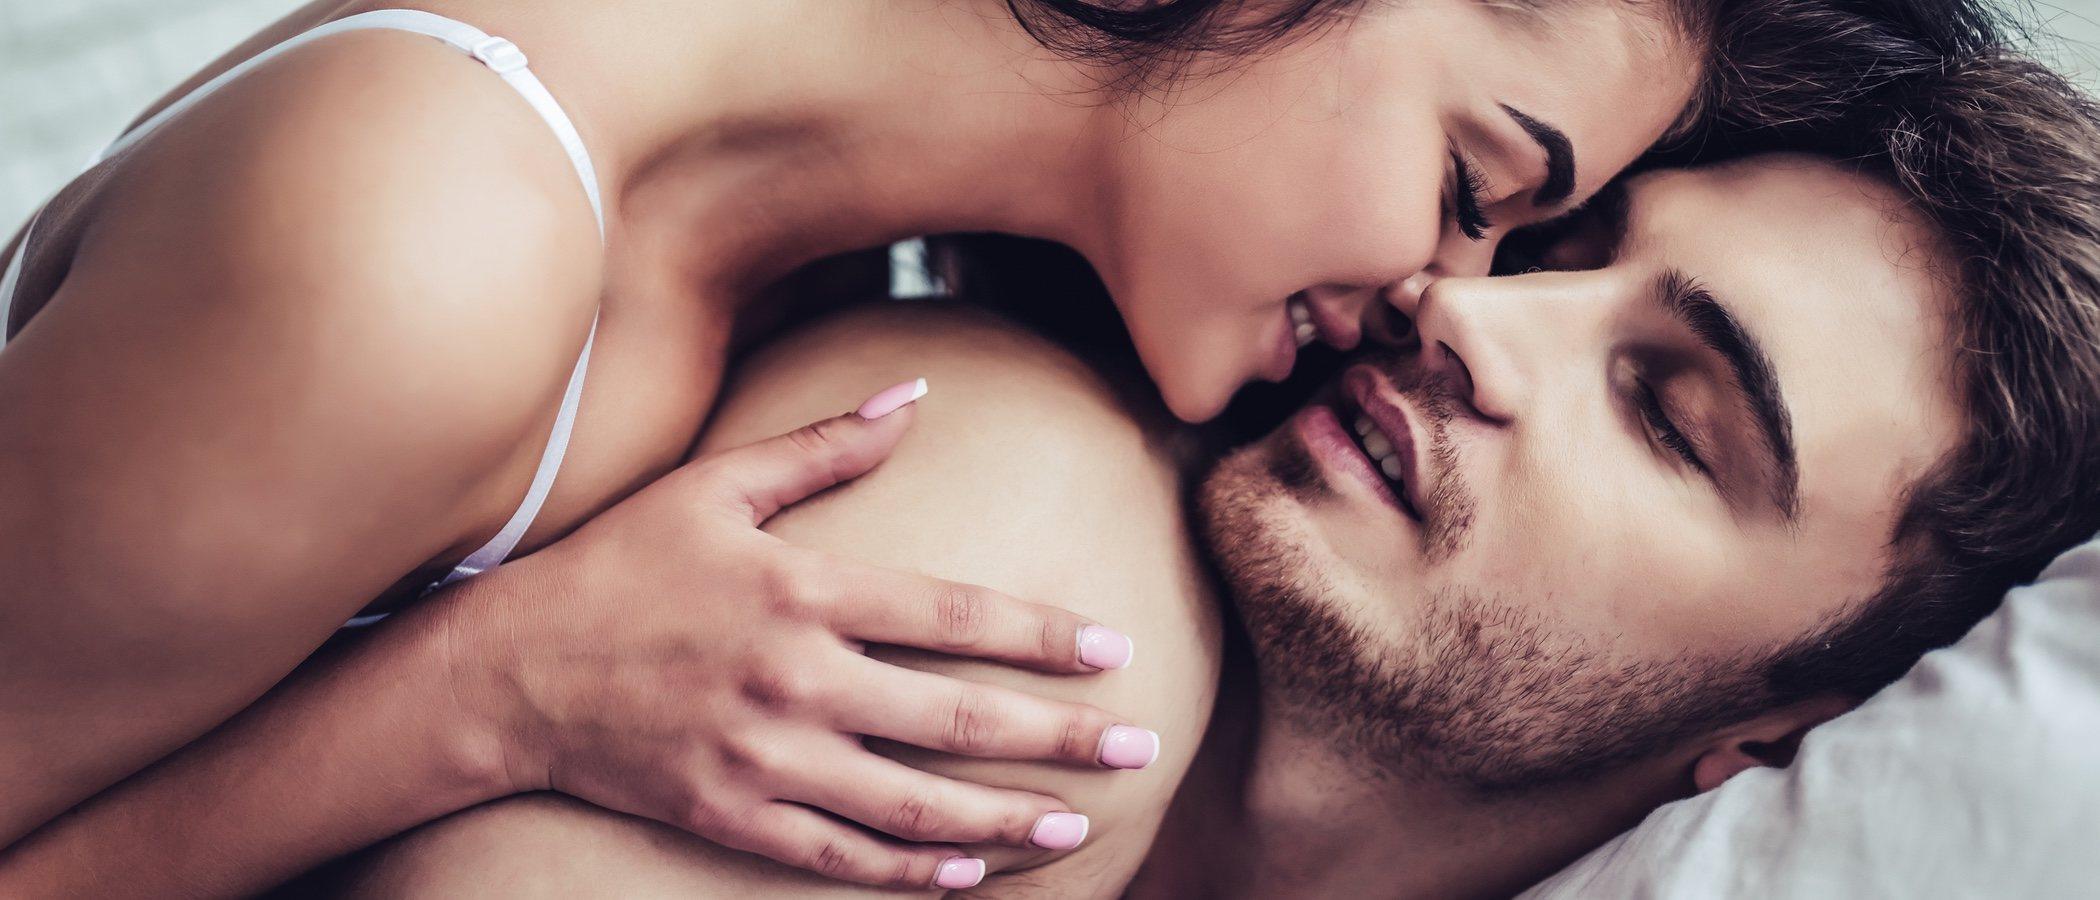 Horóscopo sexual septiembre 2019: Piscis